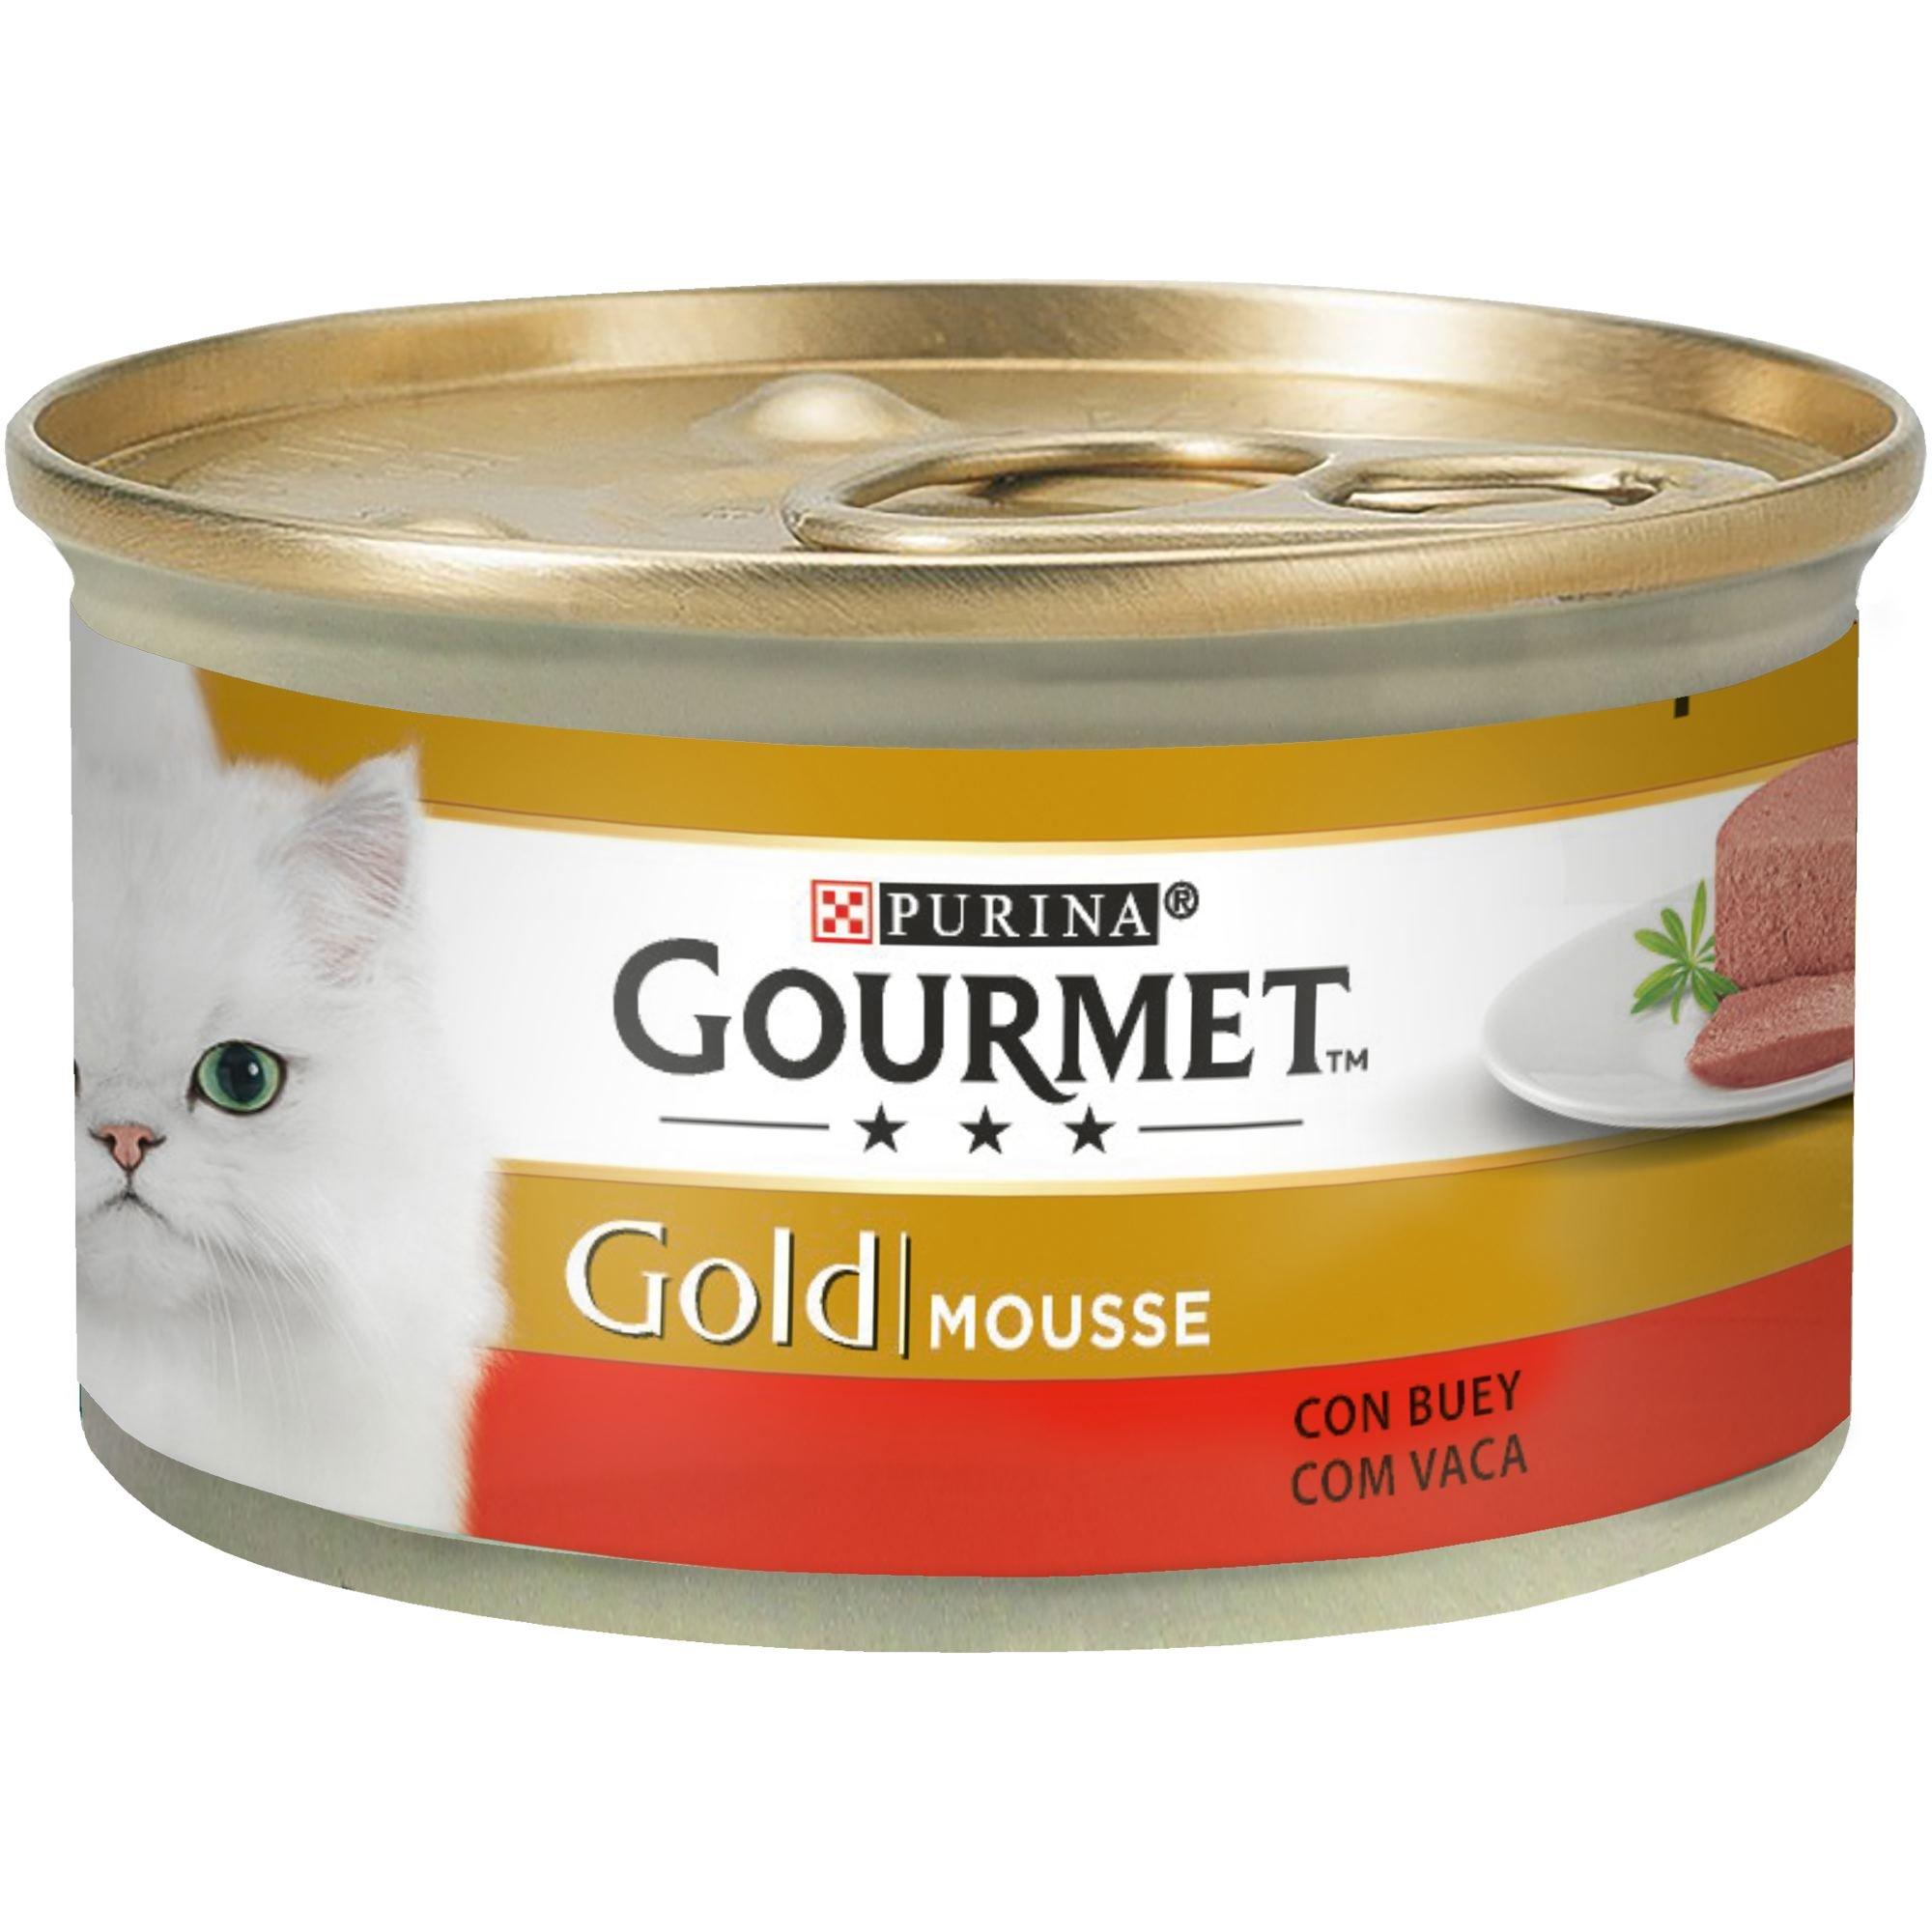 Purina Gourmet Gold Mousse comida para gatos de Pescado del Oceano 85 g